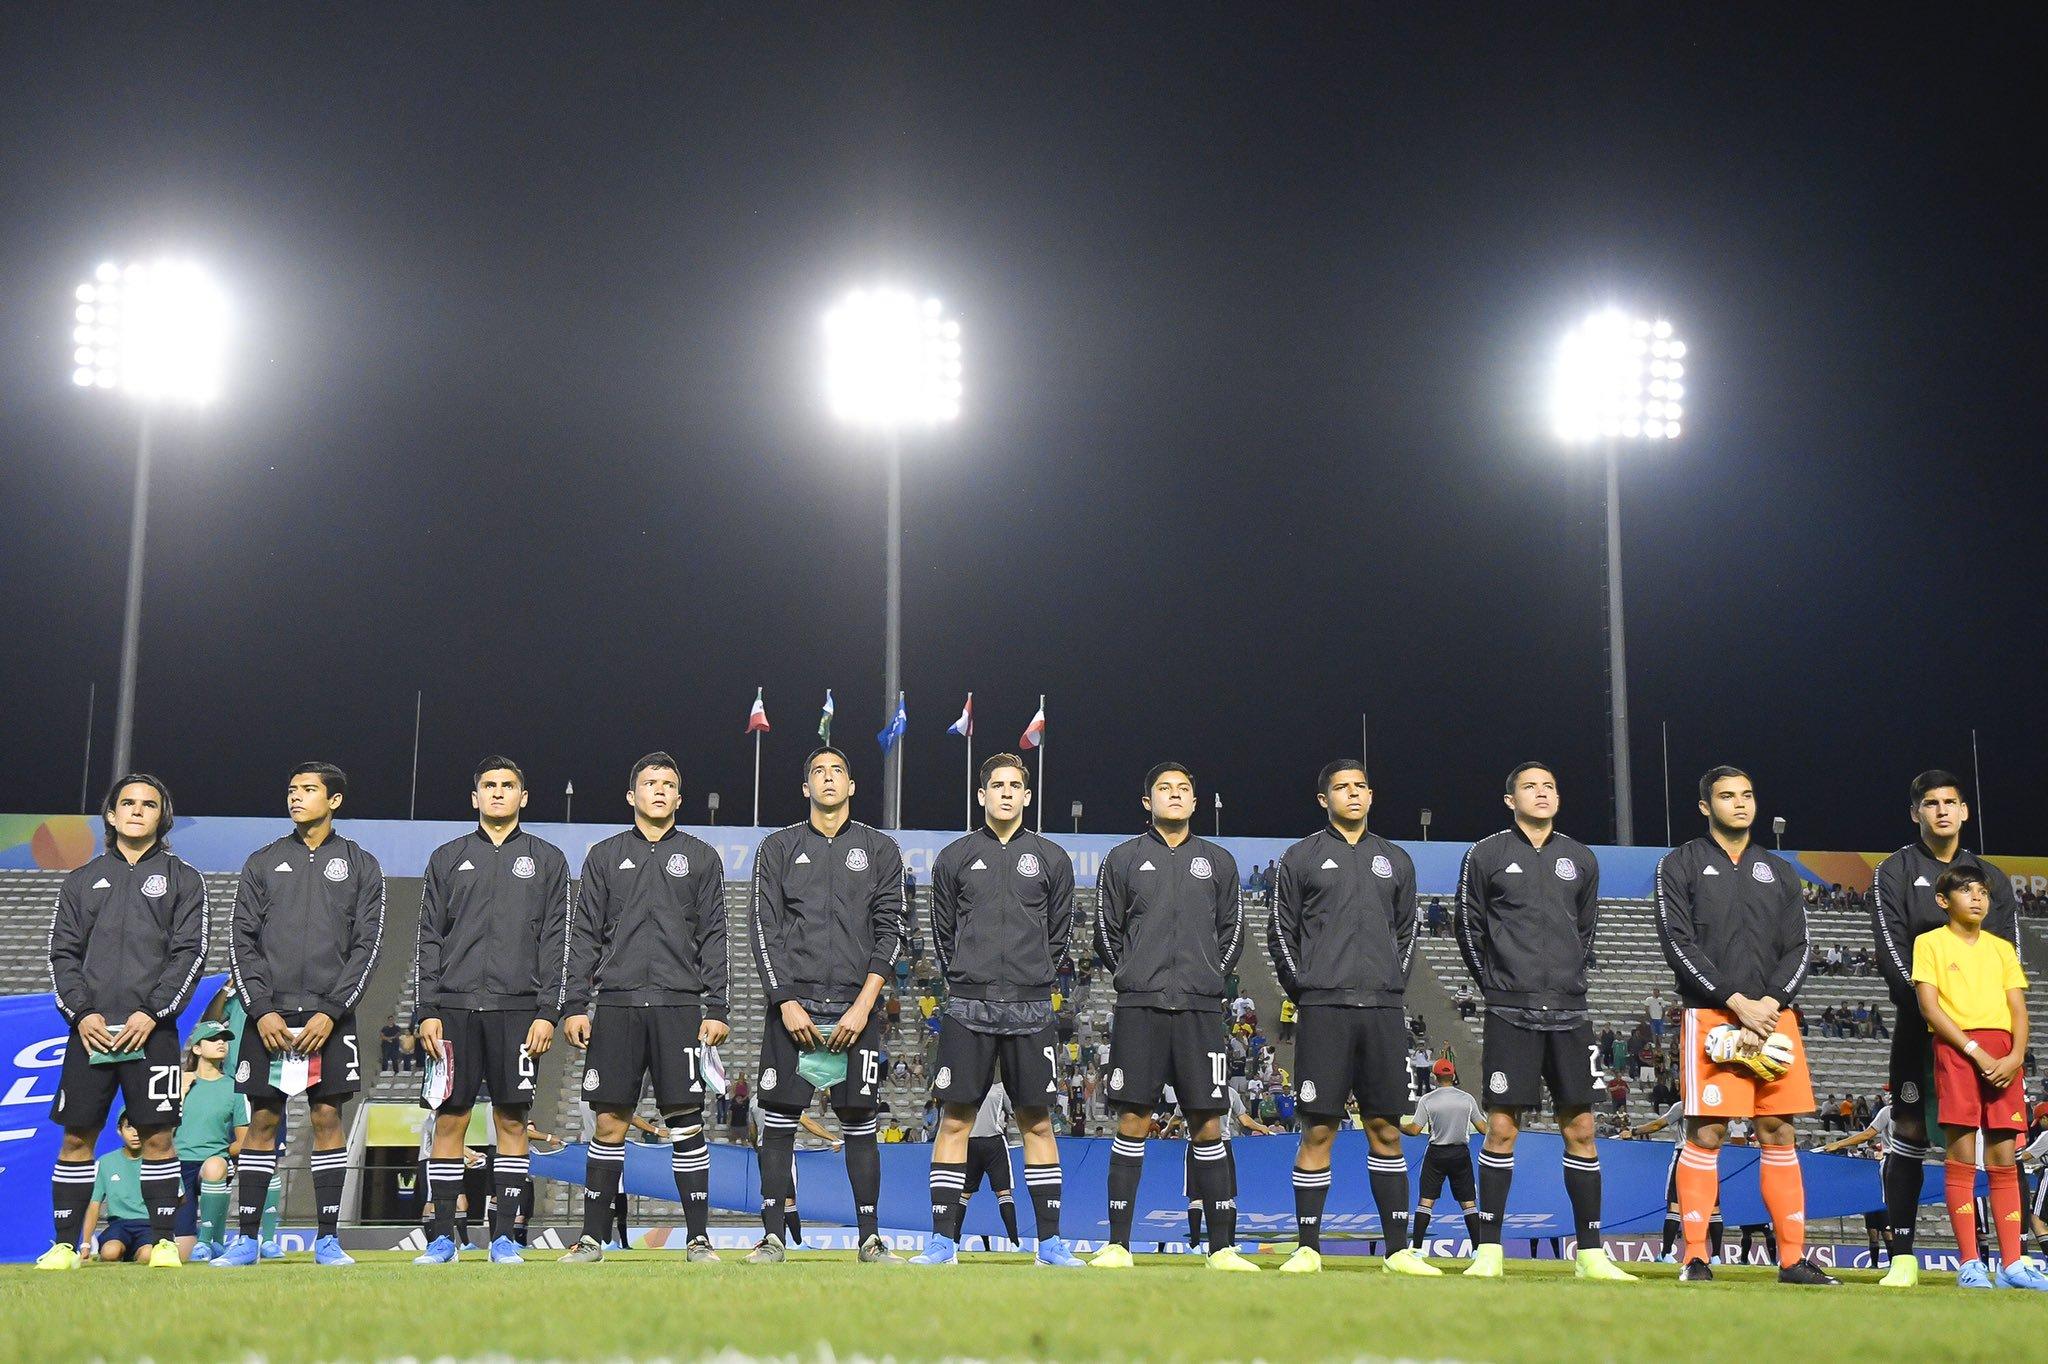 México vs Islas Salomón, En Vivo Mundial Sub-17 Brasil 2019